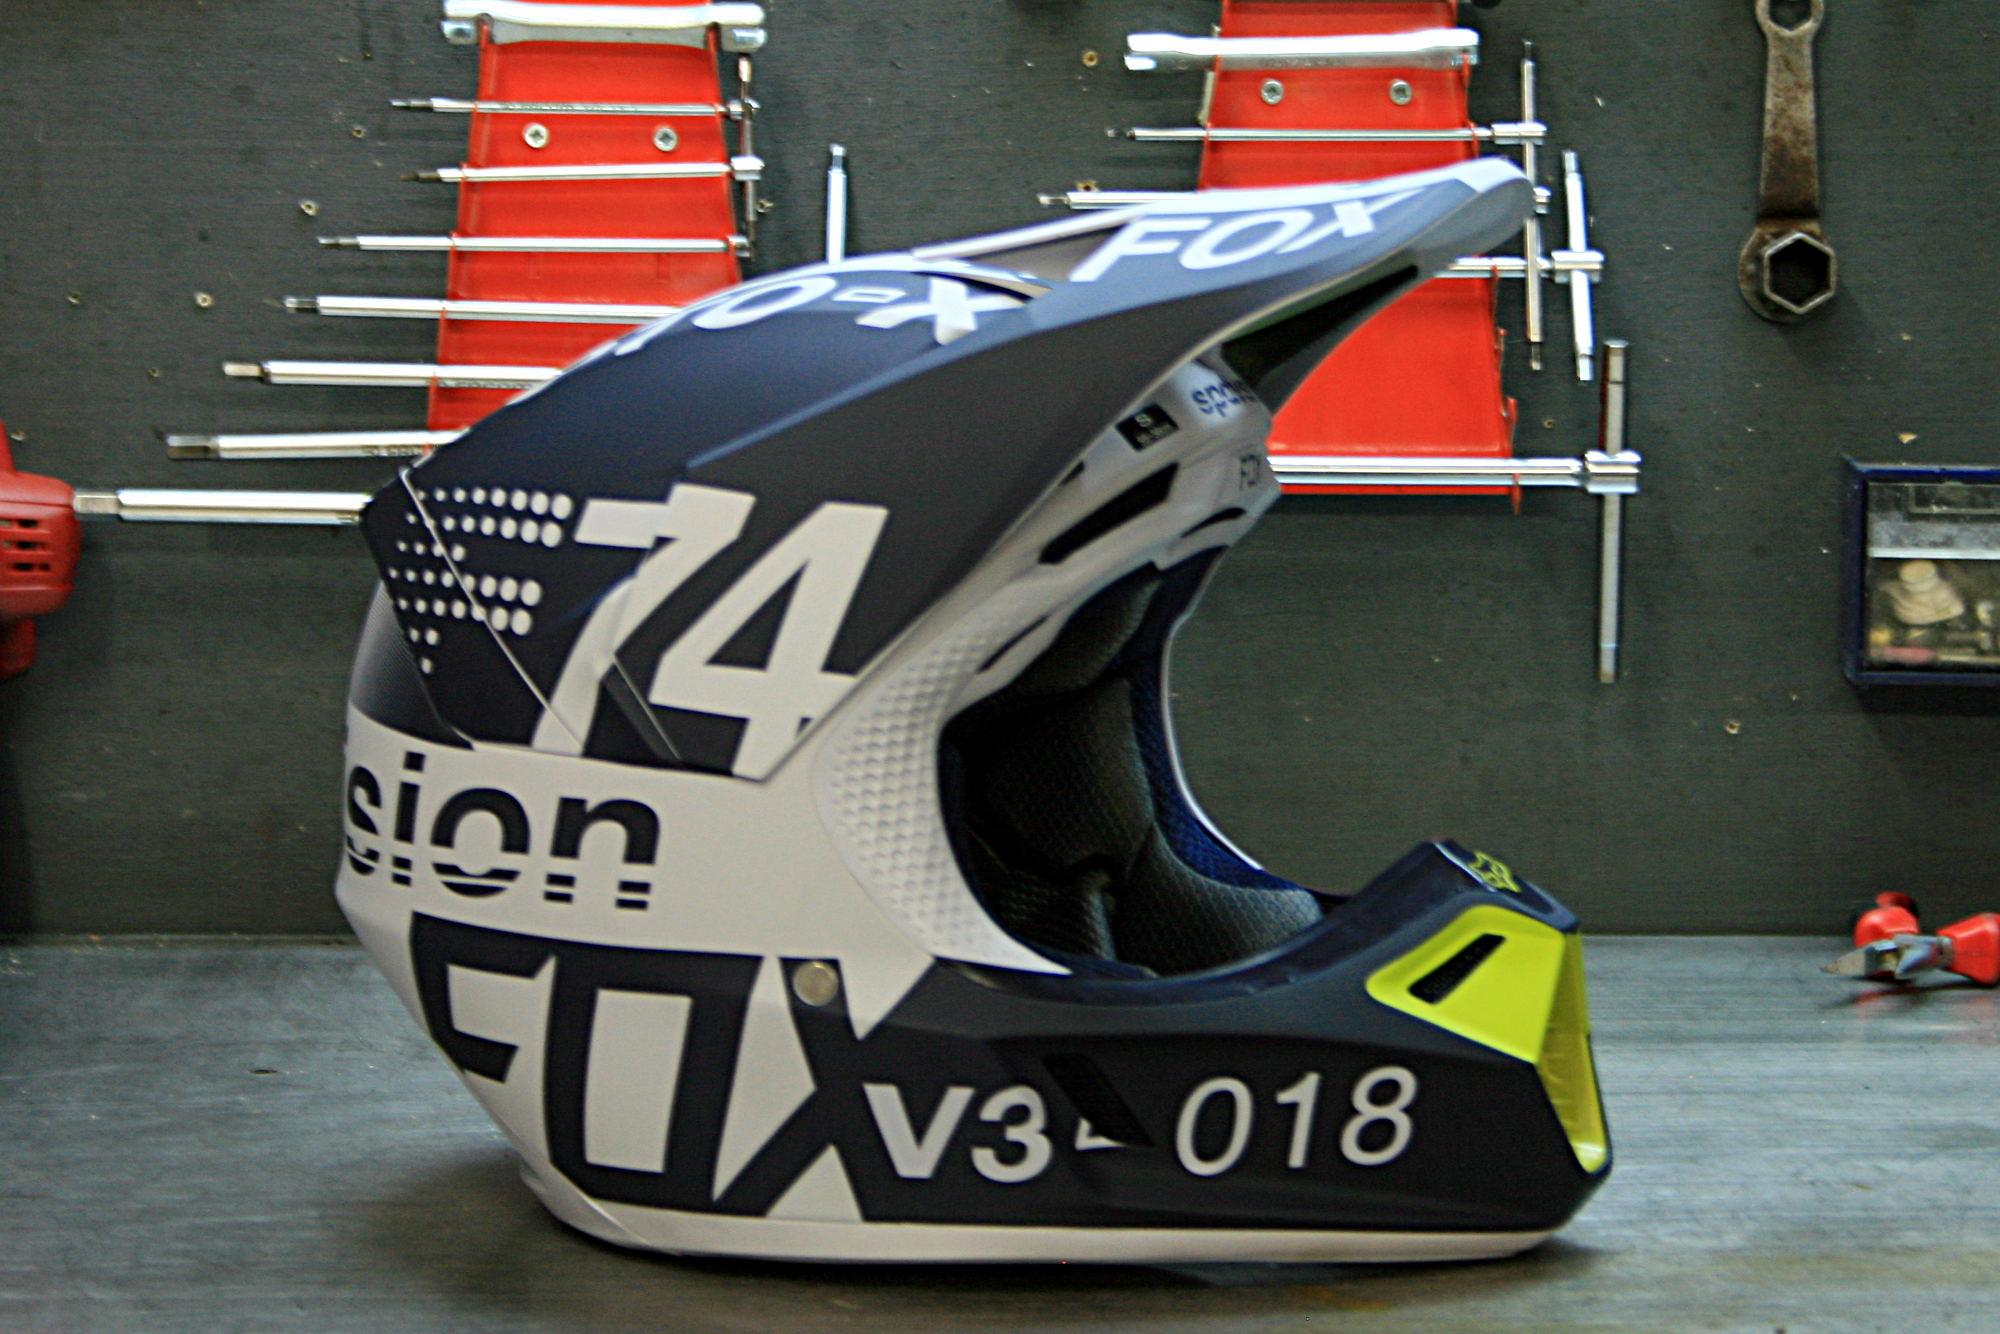 El casco FOX V3 2018, según enmendada DRAFTR